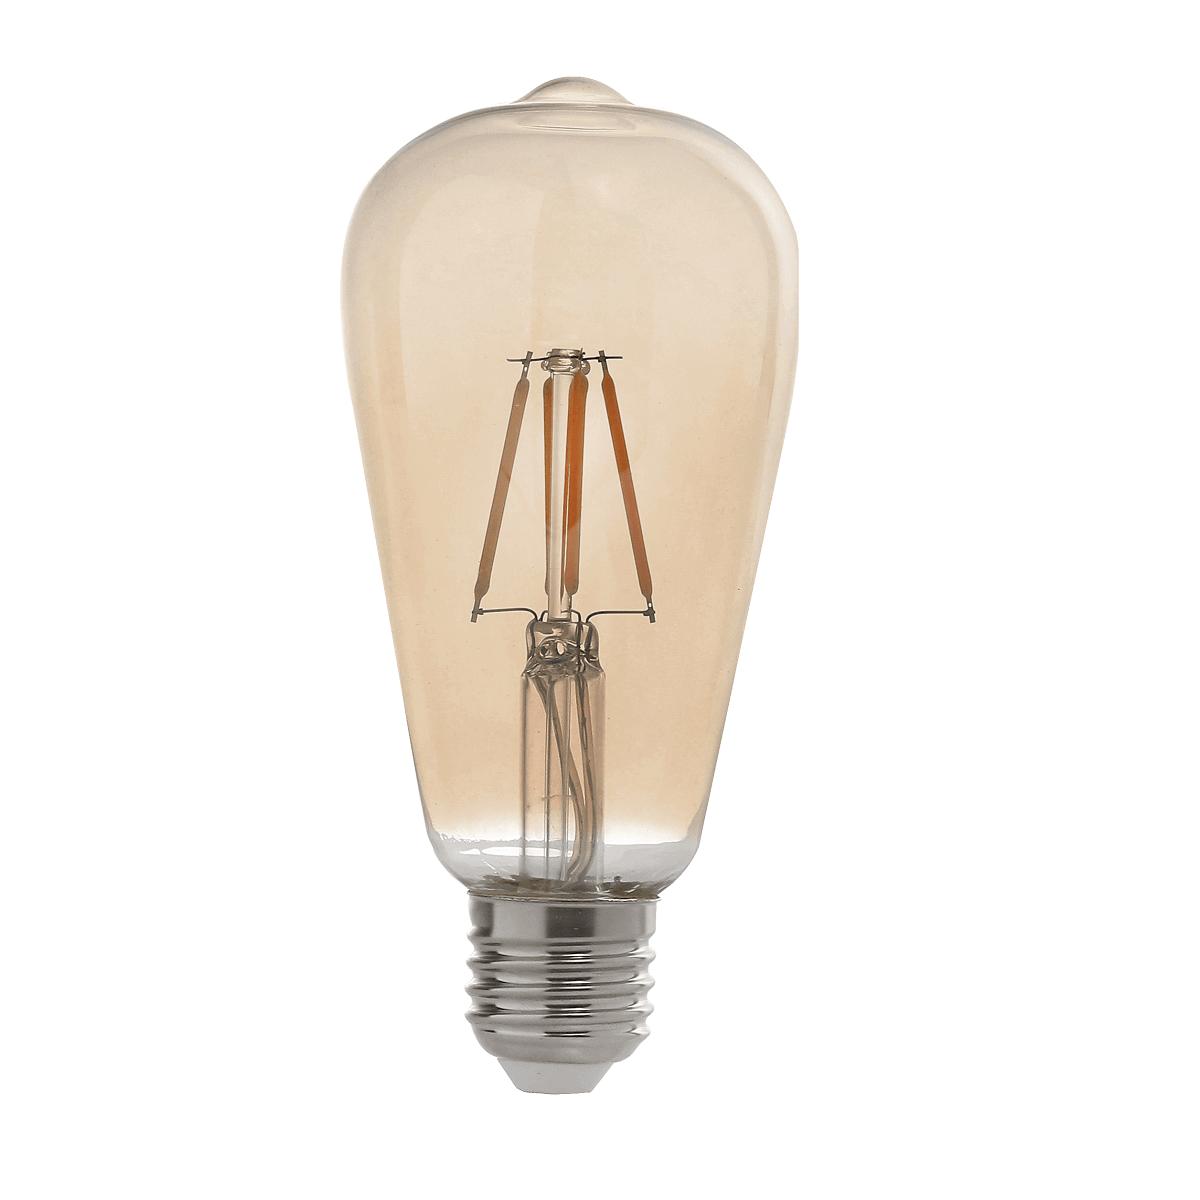 LAMPADA RETRO FILAMENTO LED ST64 2W BIVOLT MBLED